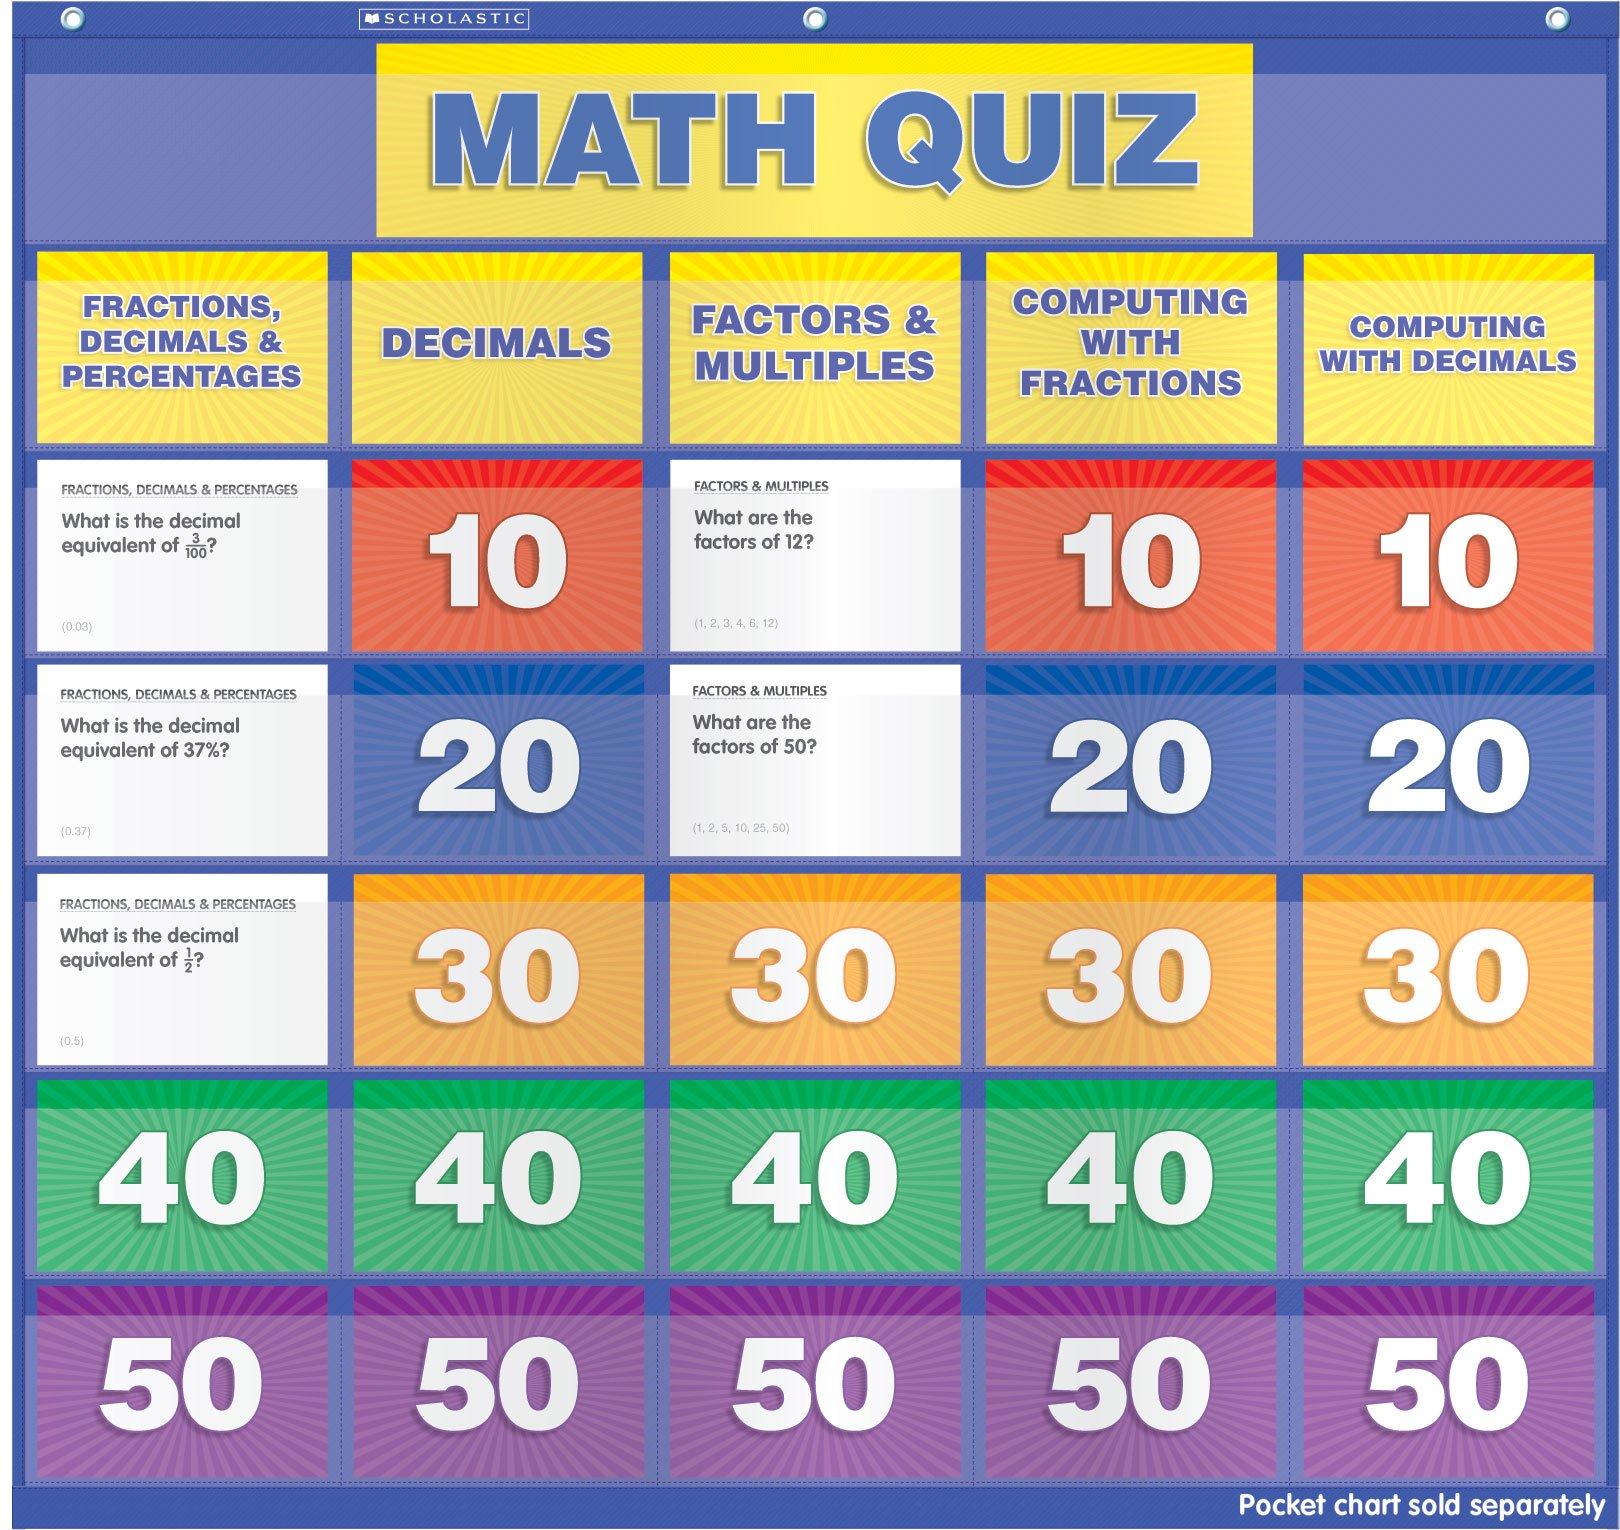 Scholastic Teacher's Friend Math Class Quiz: Grades 5-6 Pocket Chart Add-ons, Multiple Colors (TF5412)